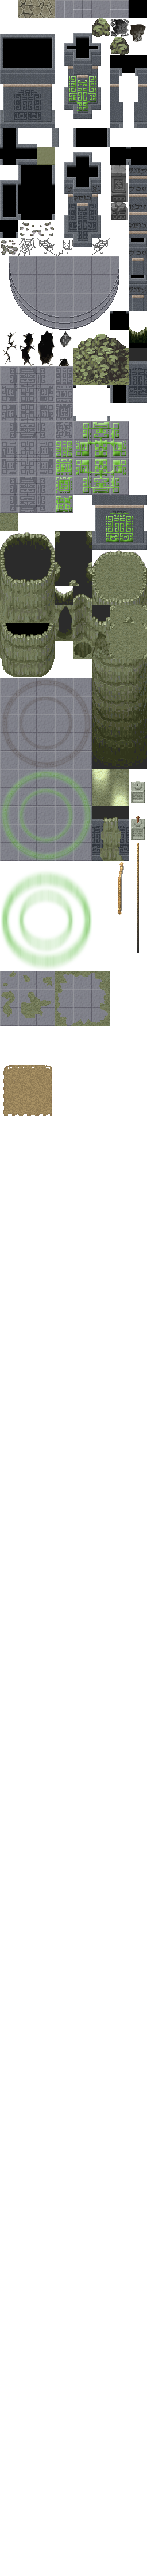 [RPG Maker XP] Tilesets by HyperSnake22 Grum_Ghul_first_Version_by_HyperSnake22